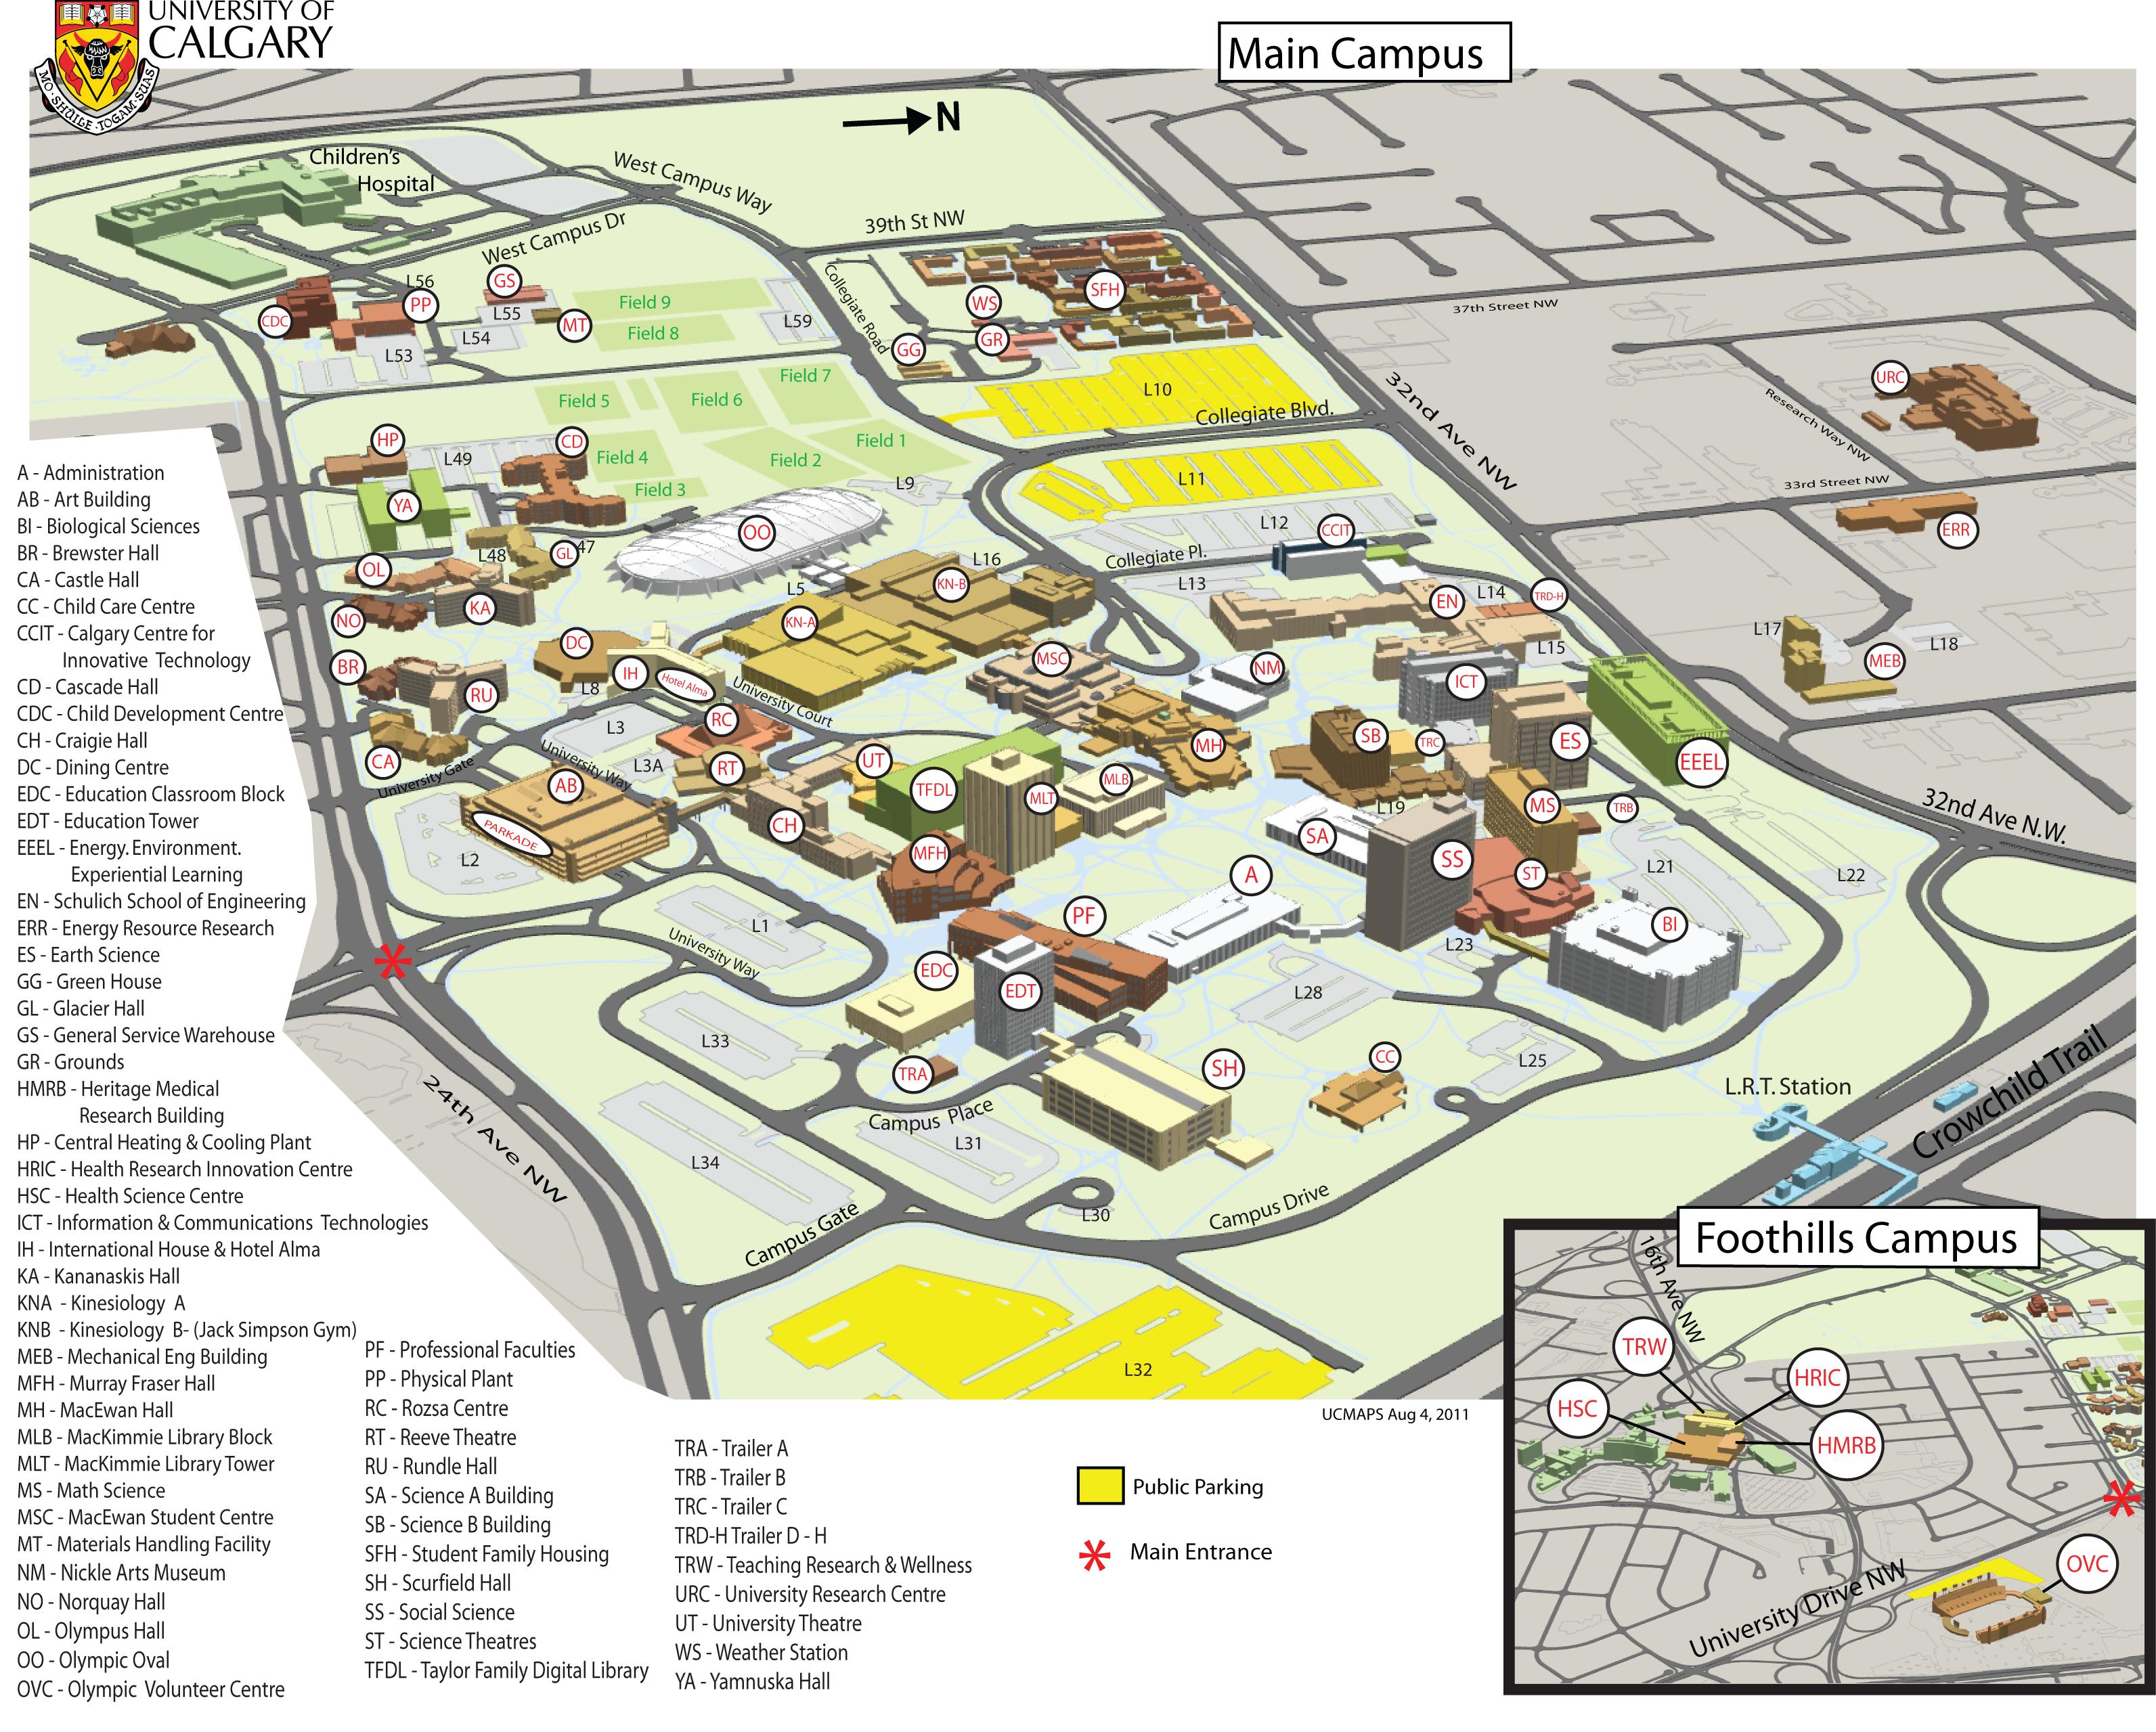 Bird Study Group - Birds Calgary on u of winnipeg campus map, university of calgary parking map, u of waterloo campus map, u of lethbridge campus map, u of memphis campus map, u of regina campus map, calgary alberta map, park map, u of c campus map,